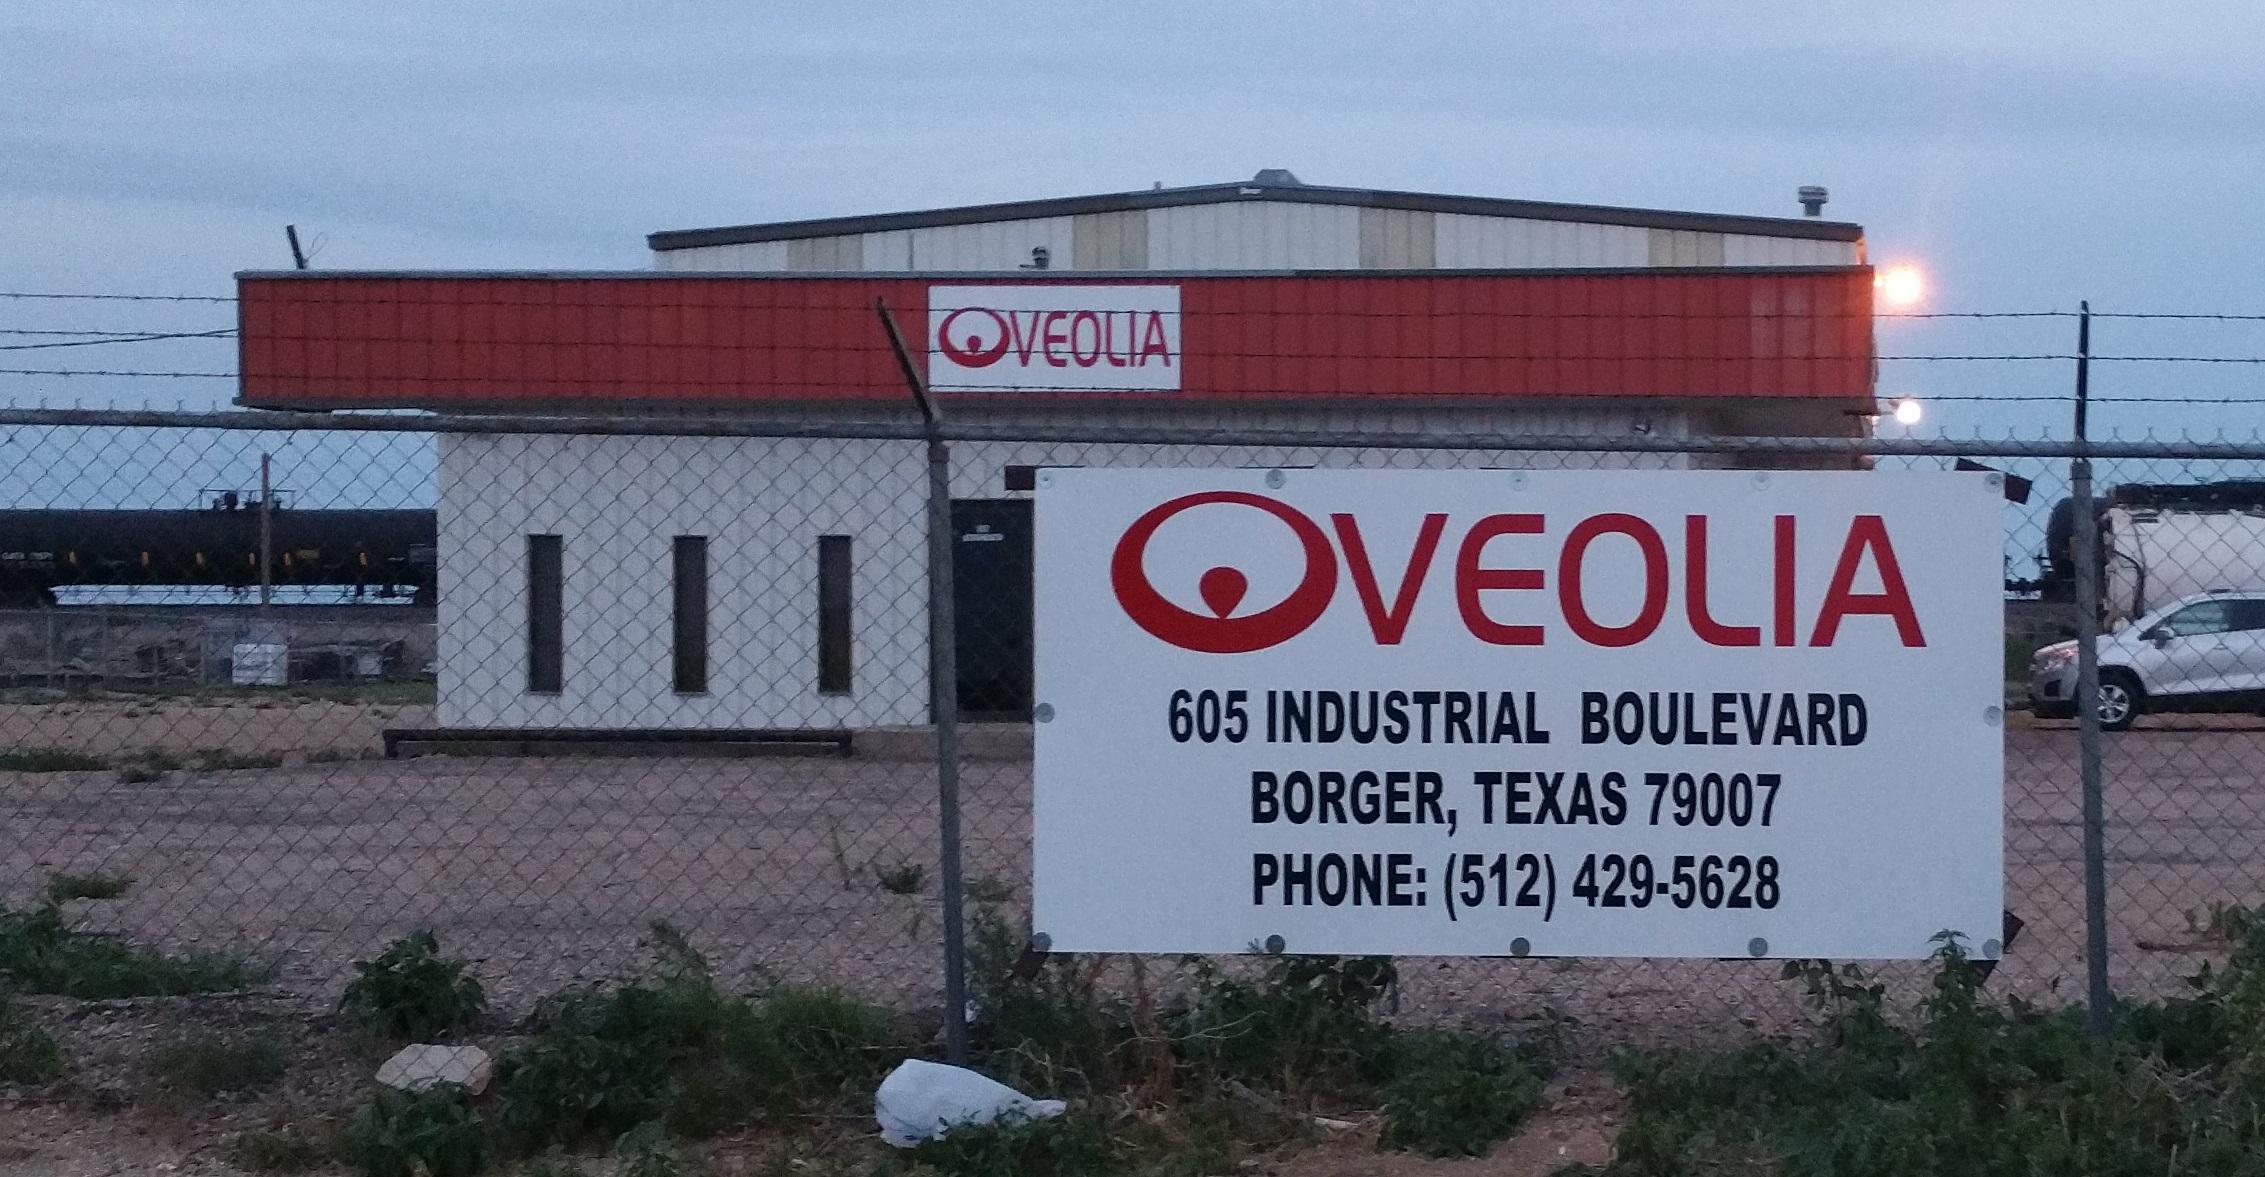 Veolia signs